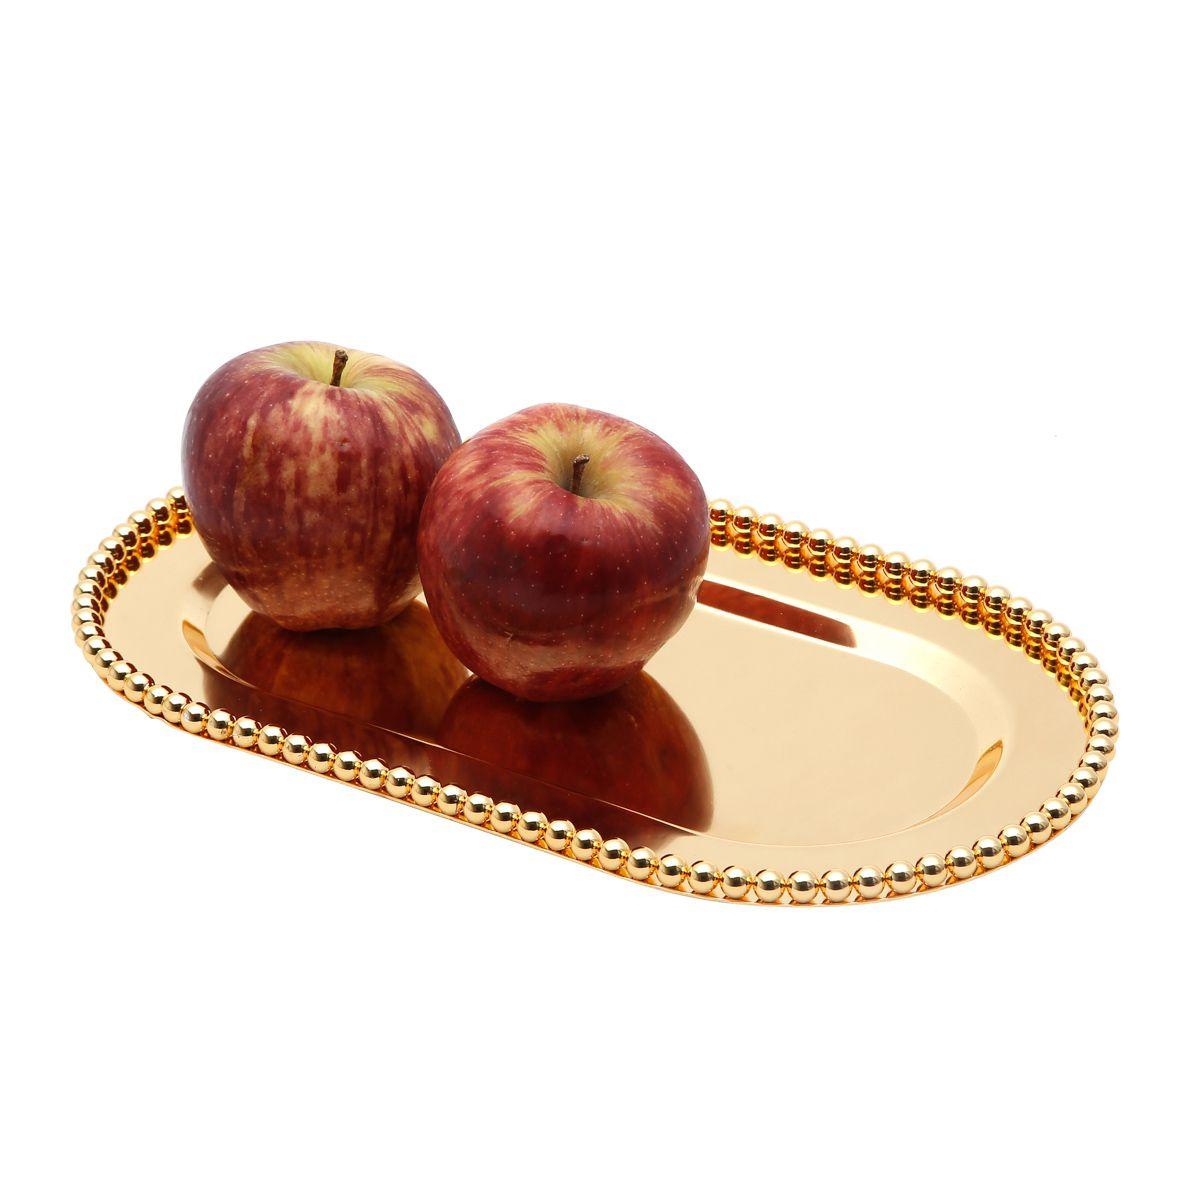 Bandeja oval 29 x 16,5 cm de zamac dourado Balls Lyor - L3745